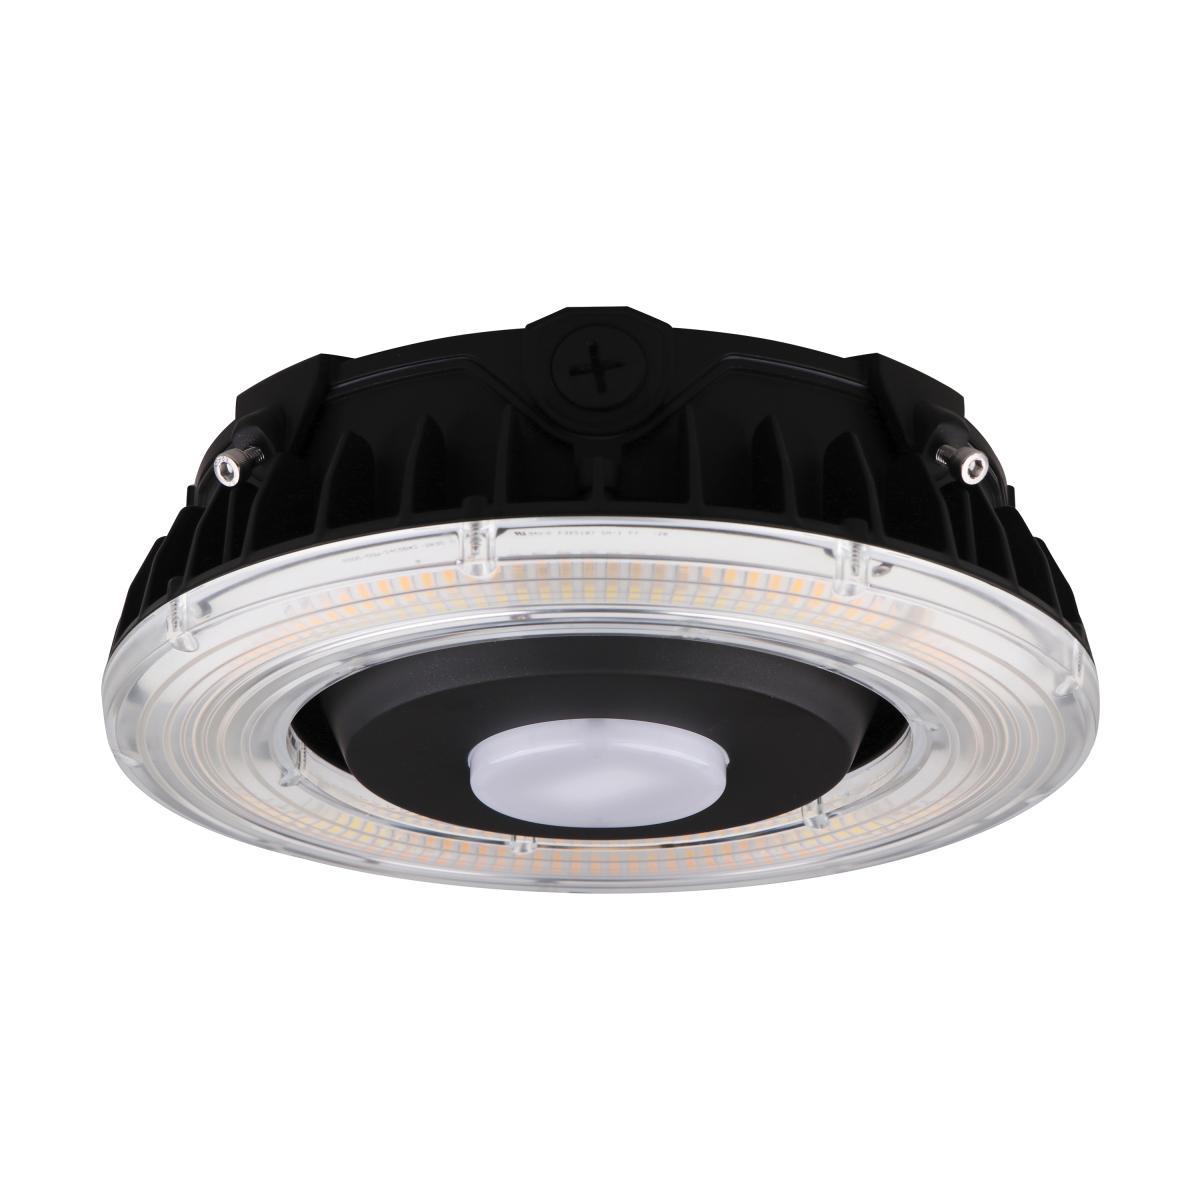 65-630 75W LED CANOPY LIGHT